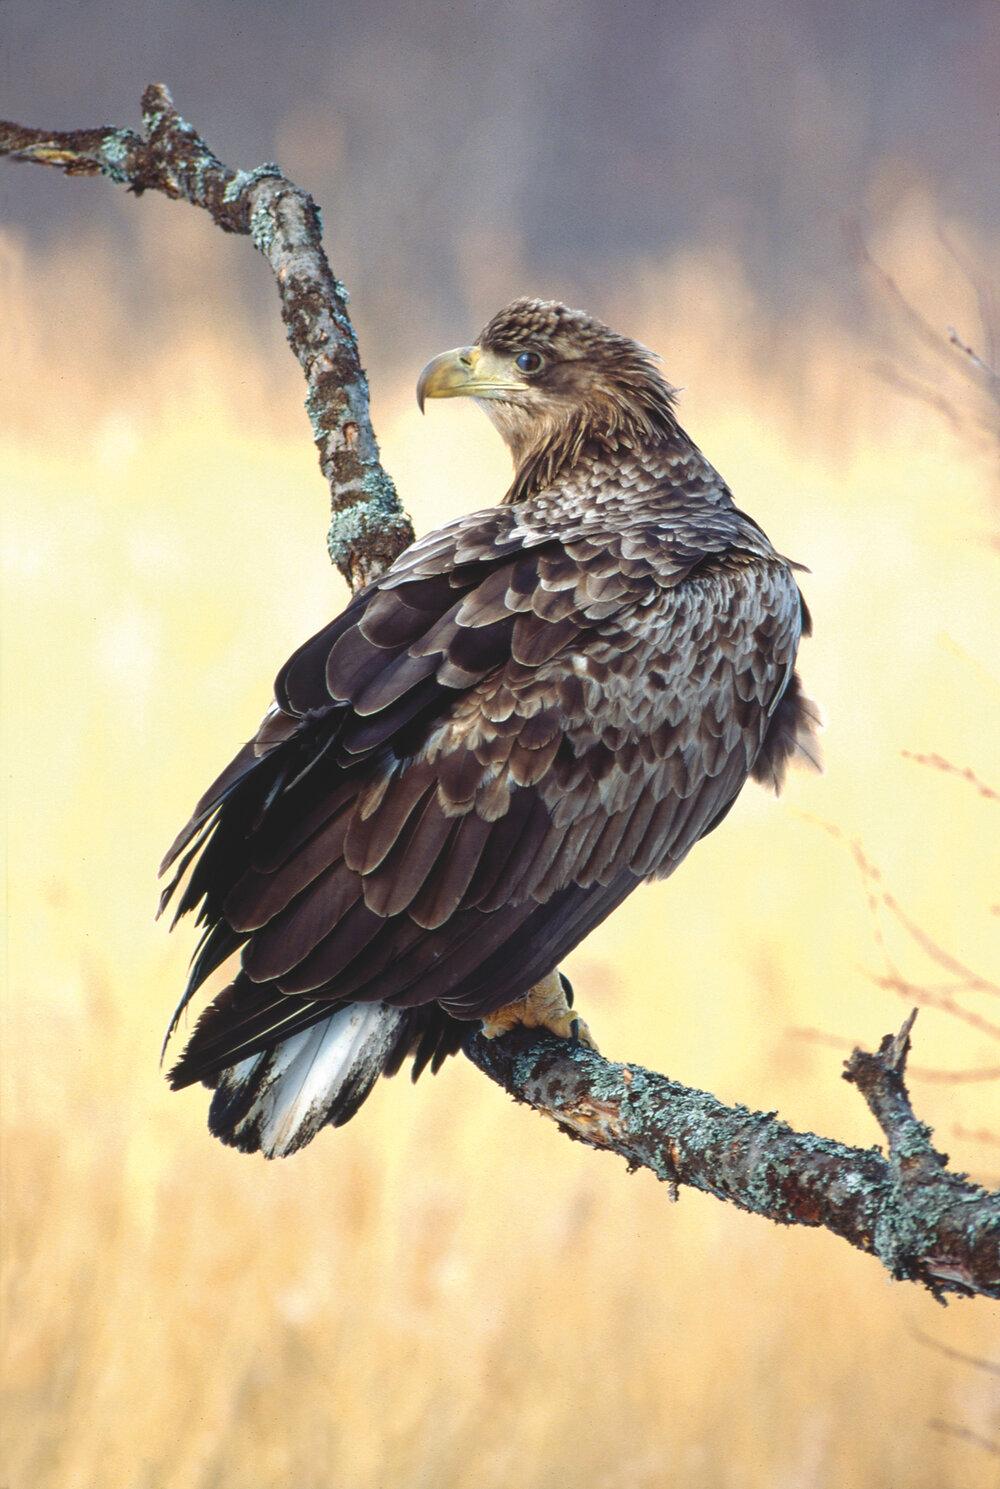 Baltic Sea Eagle, Photo - Eero Murtomäki